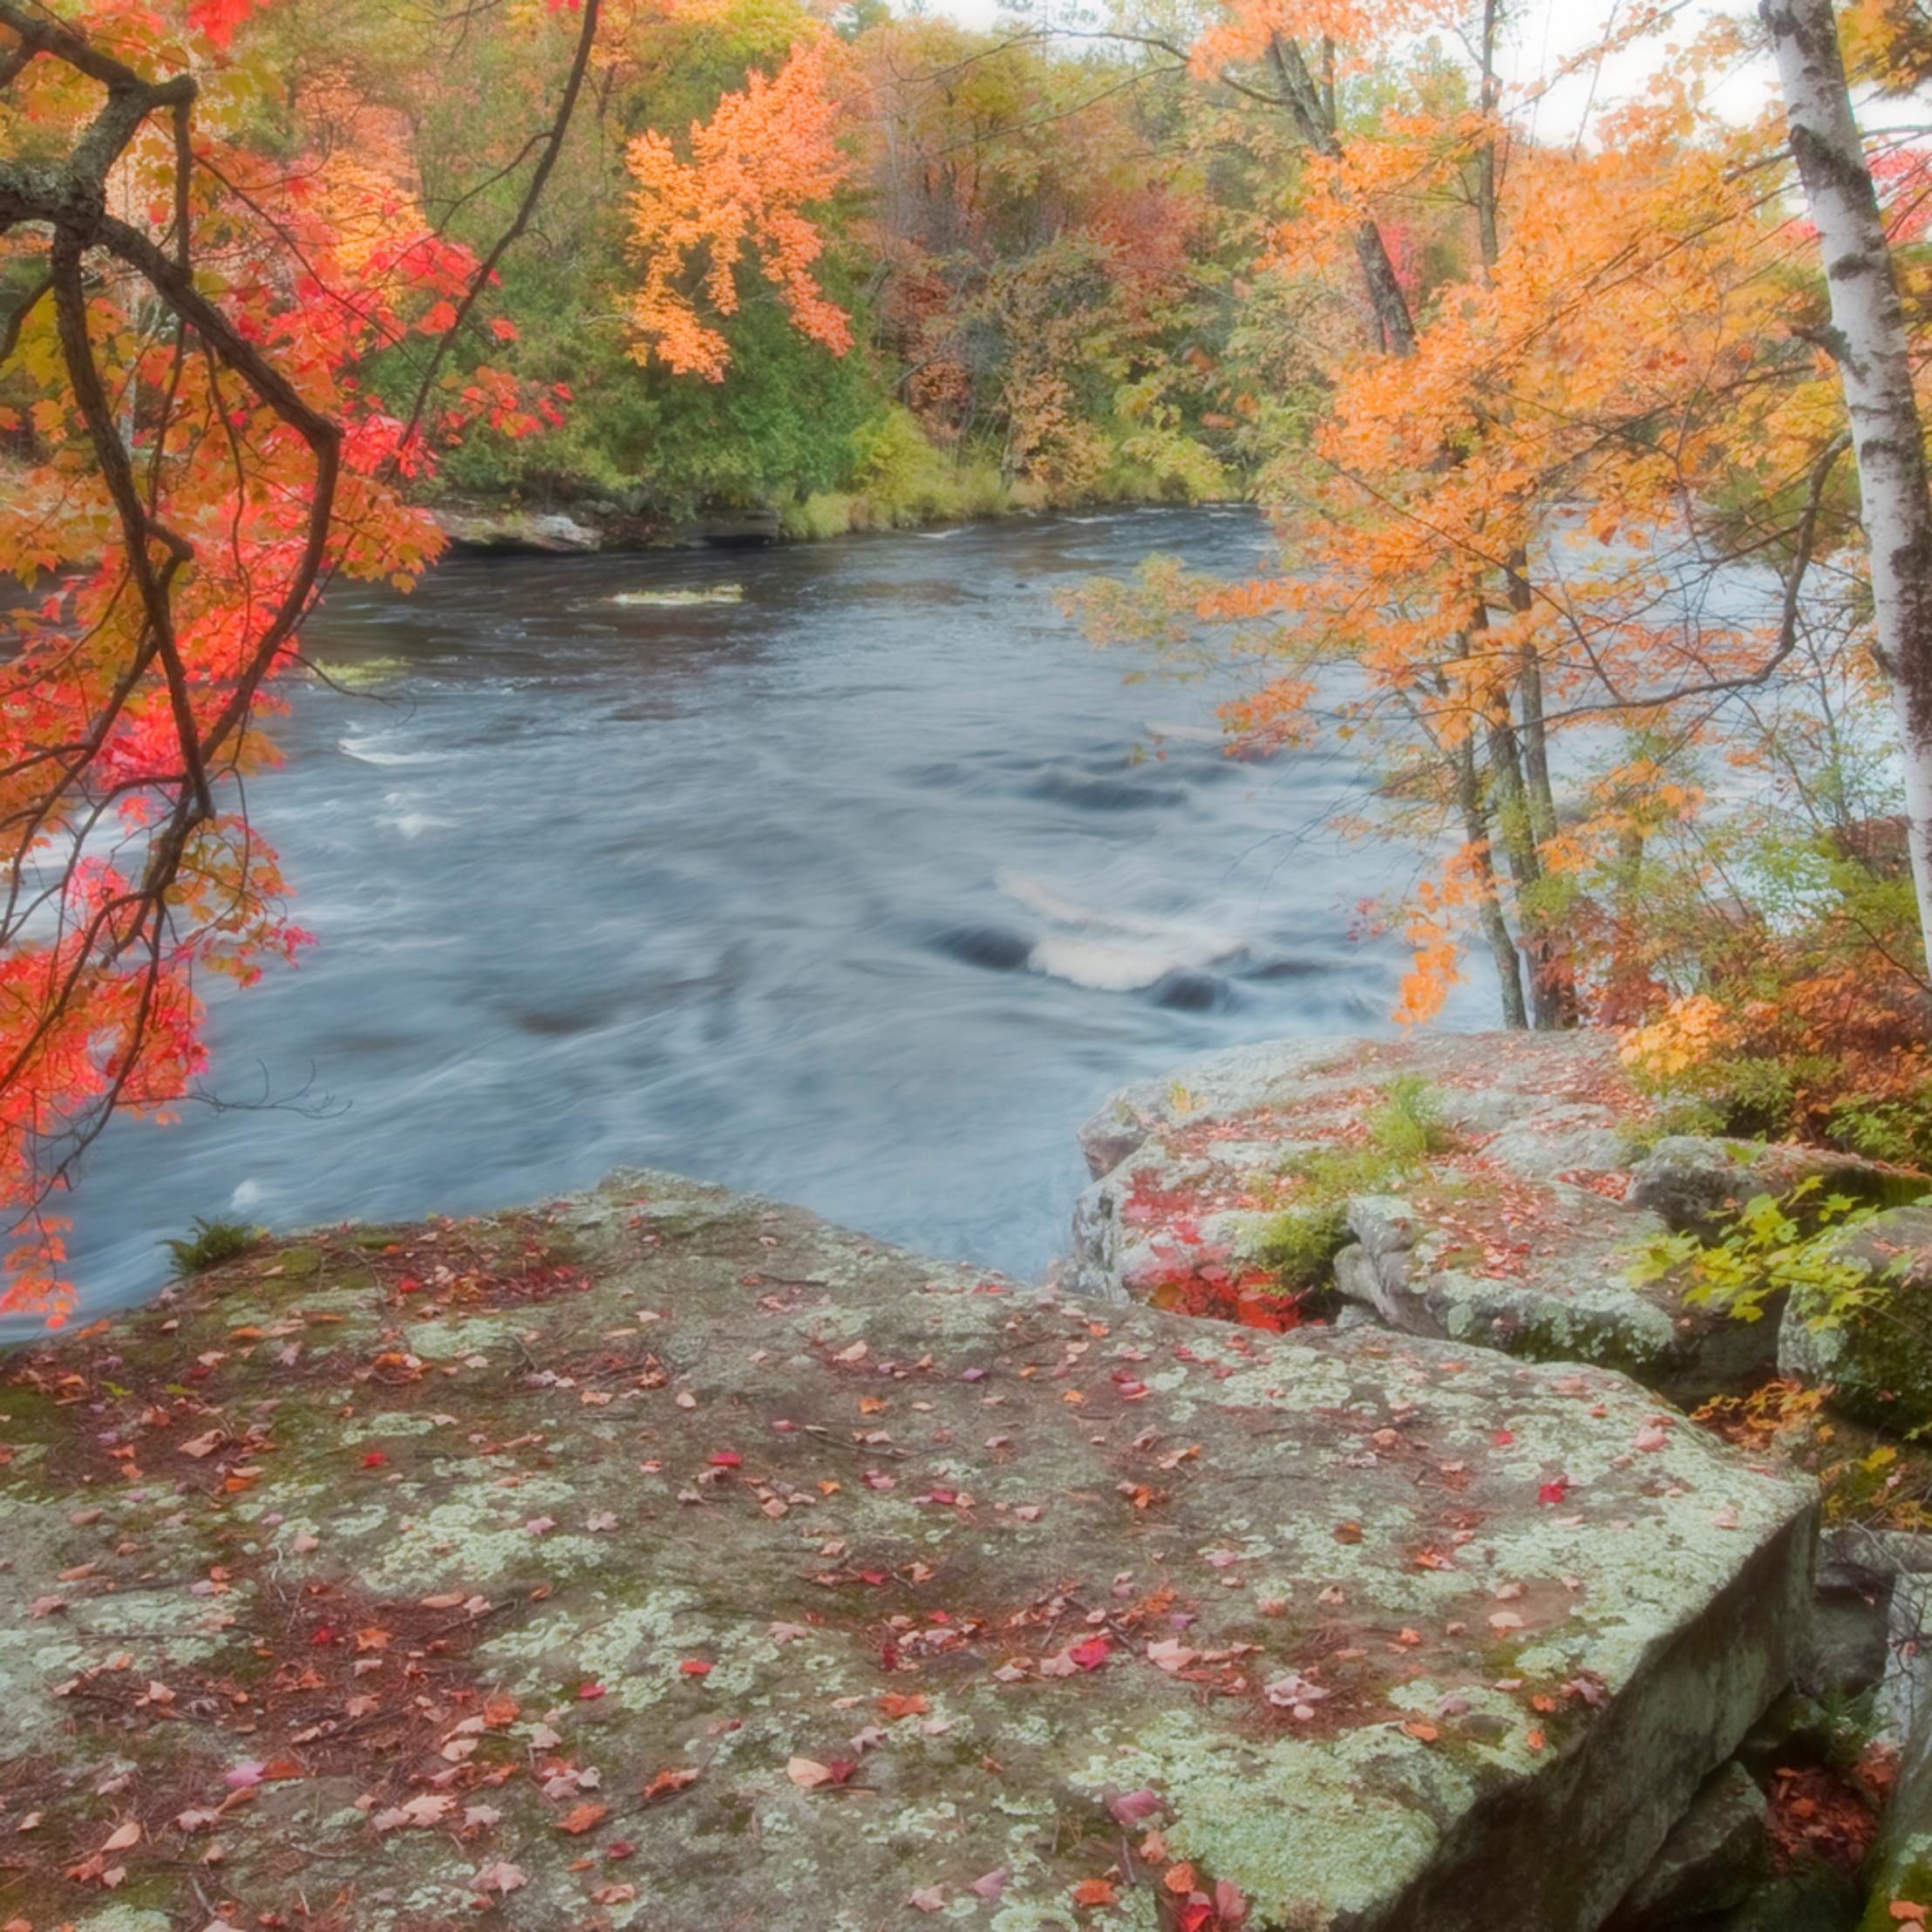 Dreaming of autumn ya3l9a